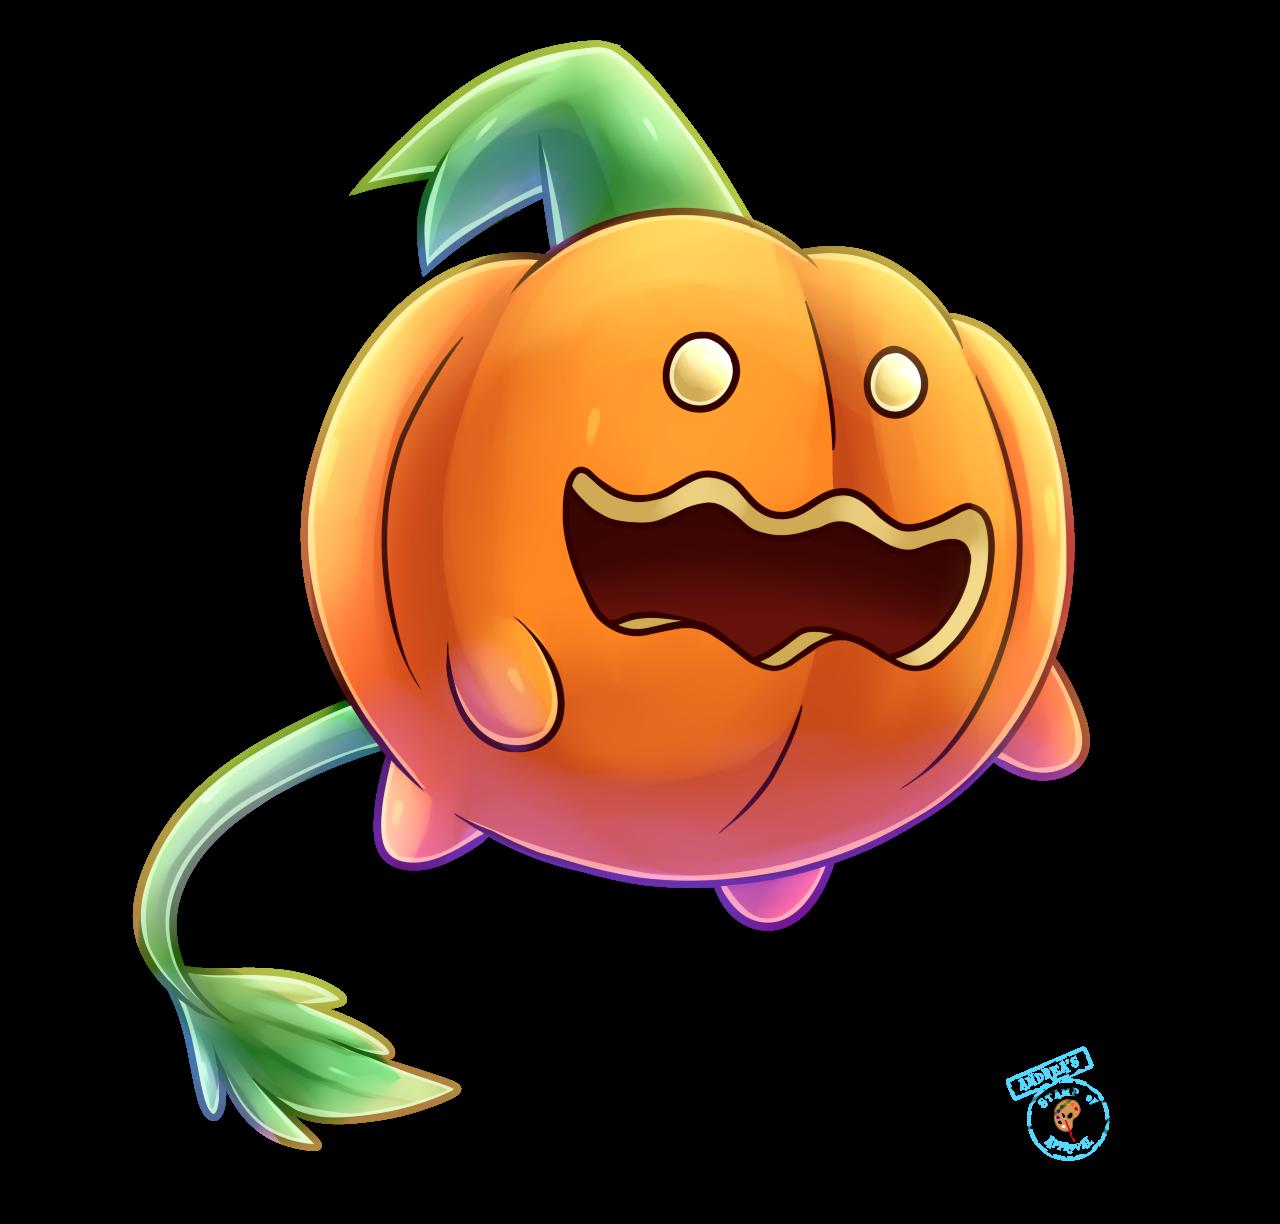 Steven Universe Pumpkin fan art for Thanksgiving ;w; Happy Thanksgiving! :D